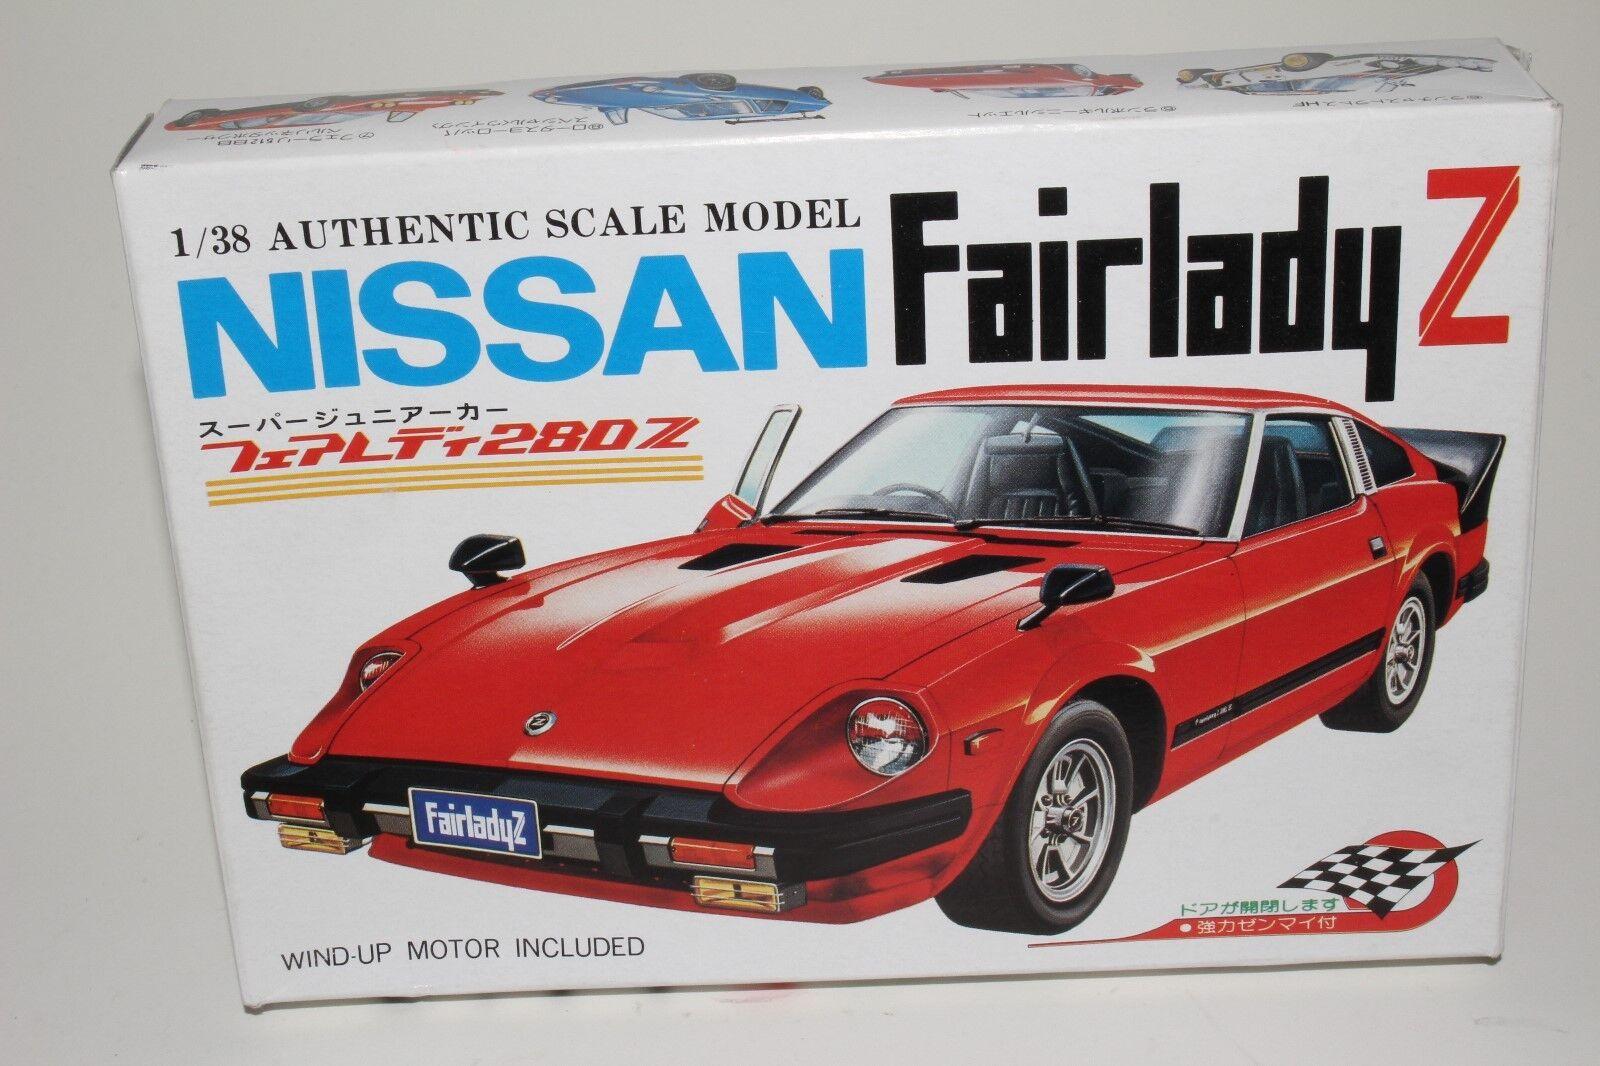 Kawai Japan Japan Japan 1 38 Datsun NISSAN FAIRLADY Z DATSUN 280 Model Car Kit 73d767